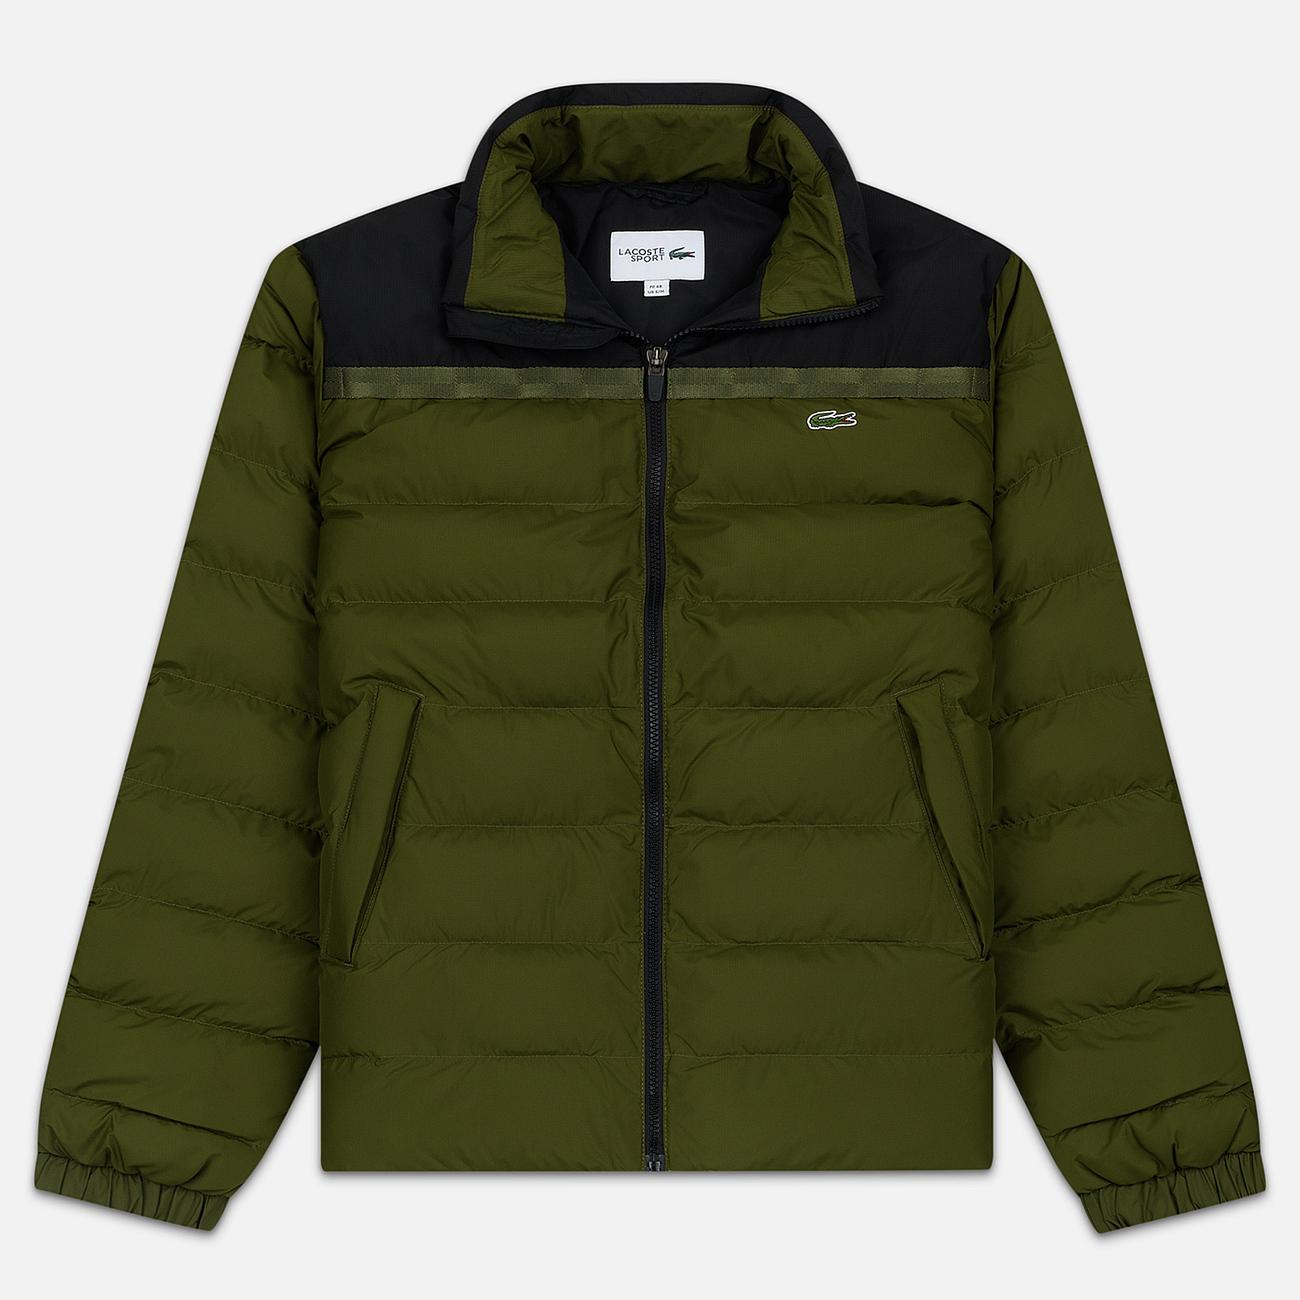 Мужской пуховик Lacoste Sport Colourblock Water-Resistant Black/Khaki Green